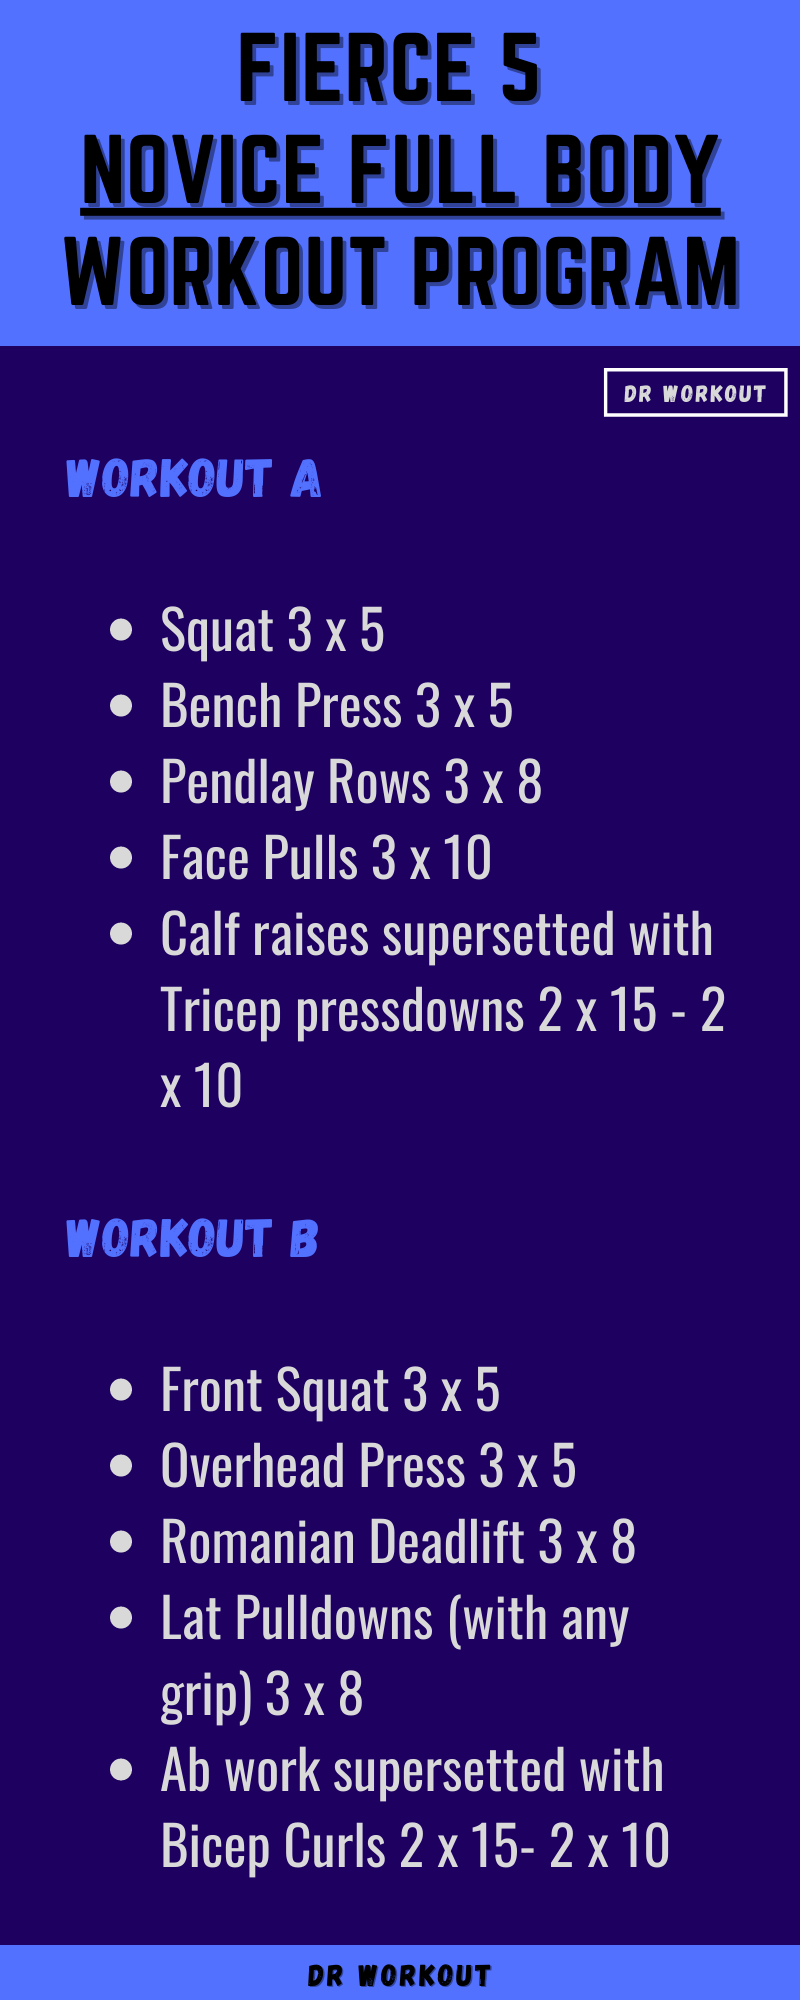 Fierce 5 Novice Full Body Workout Program